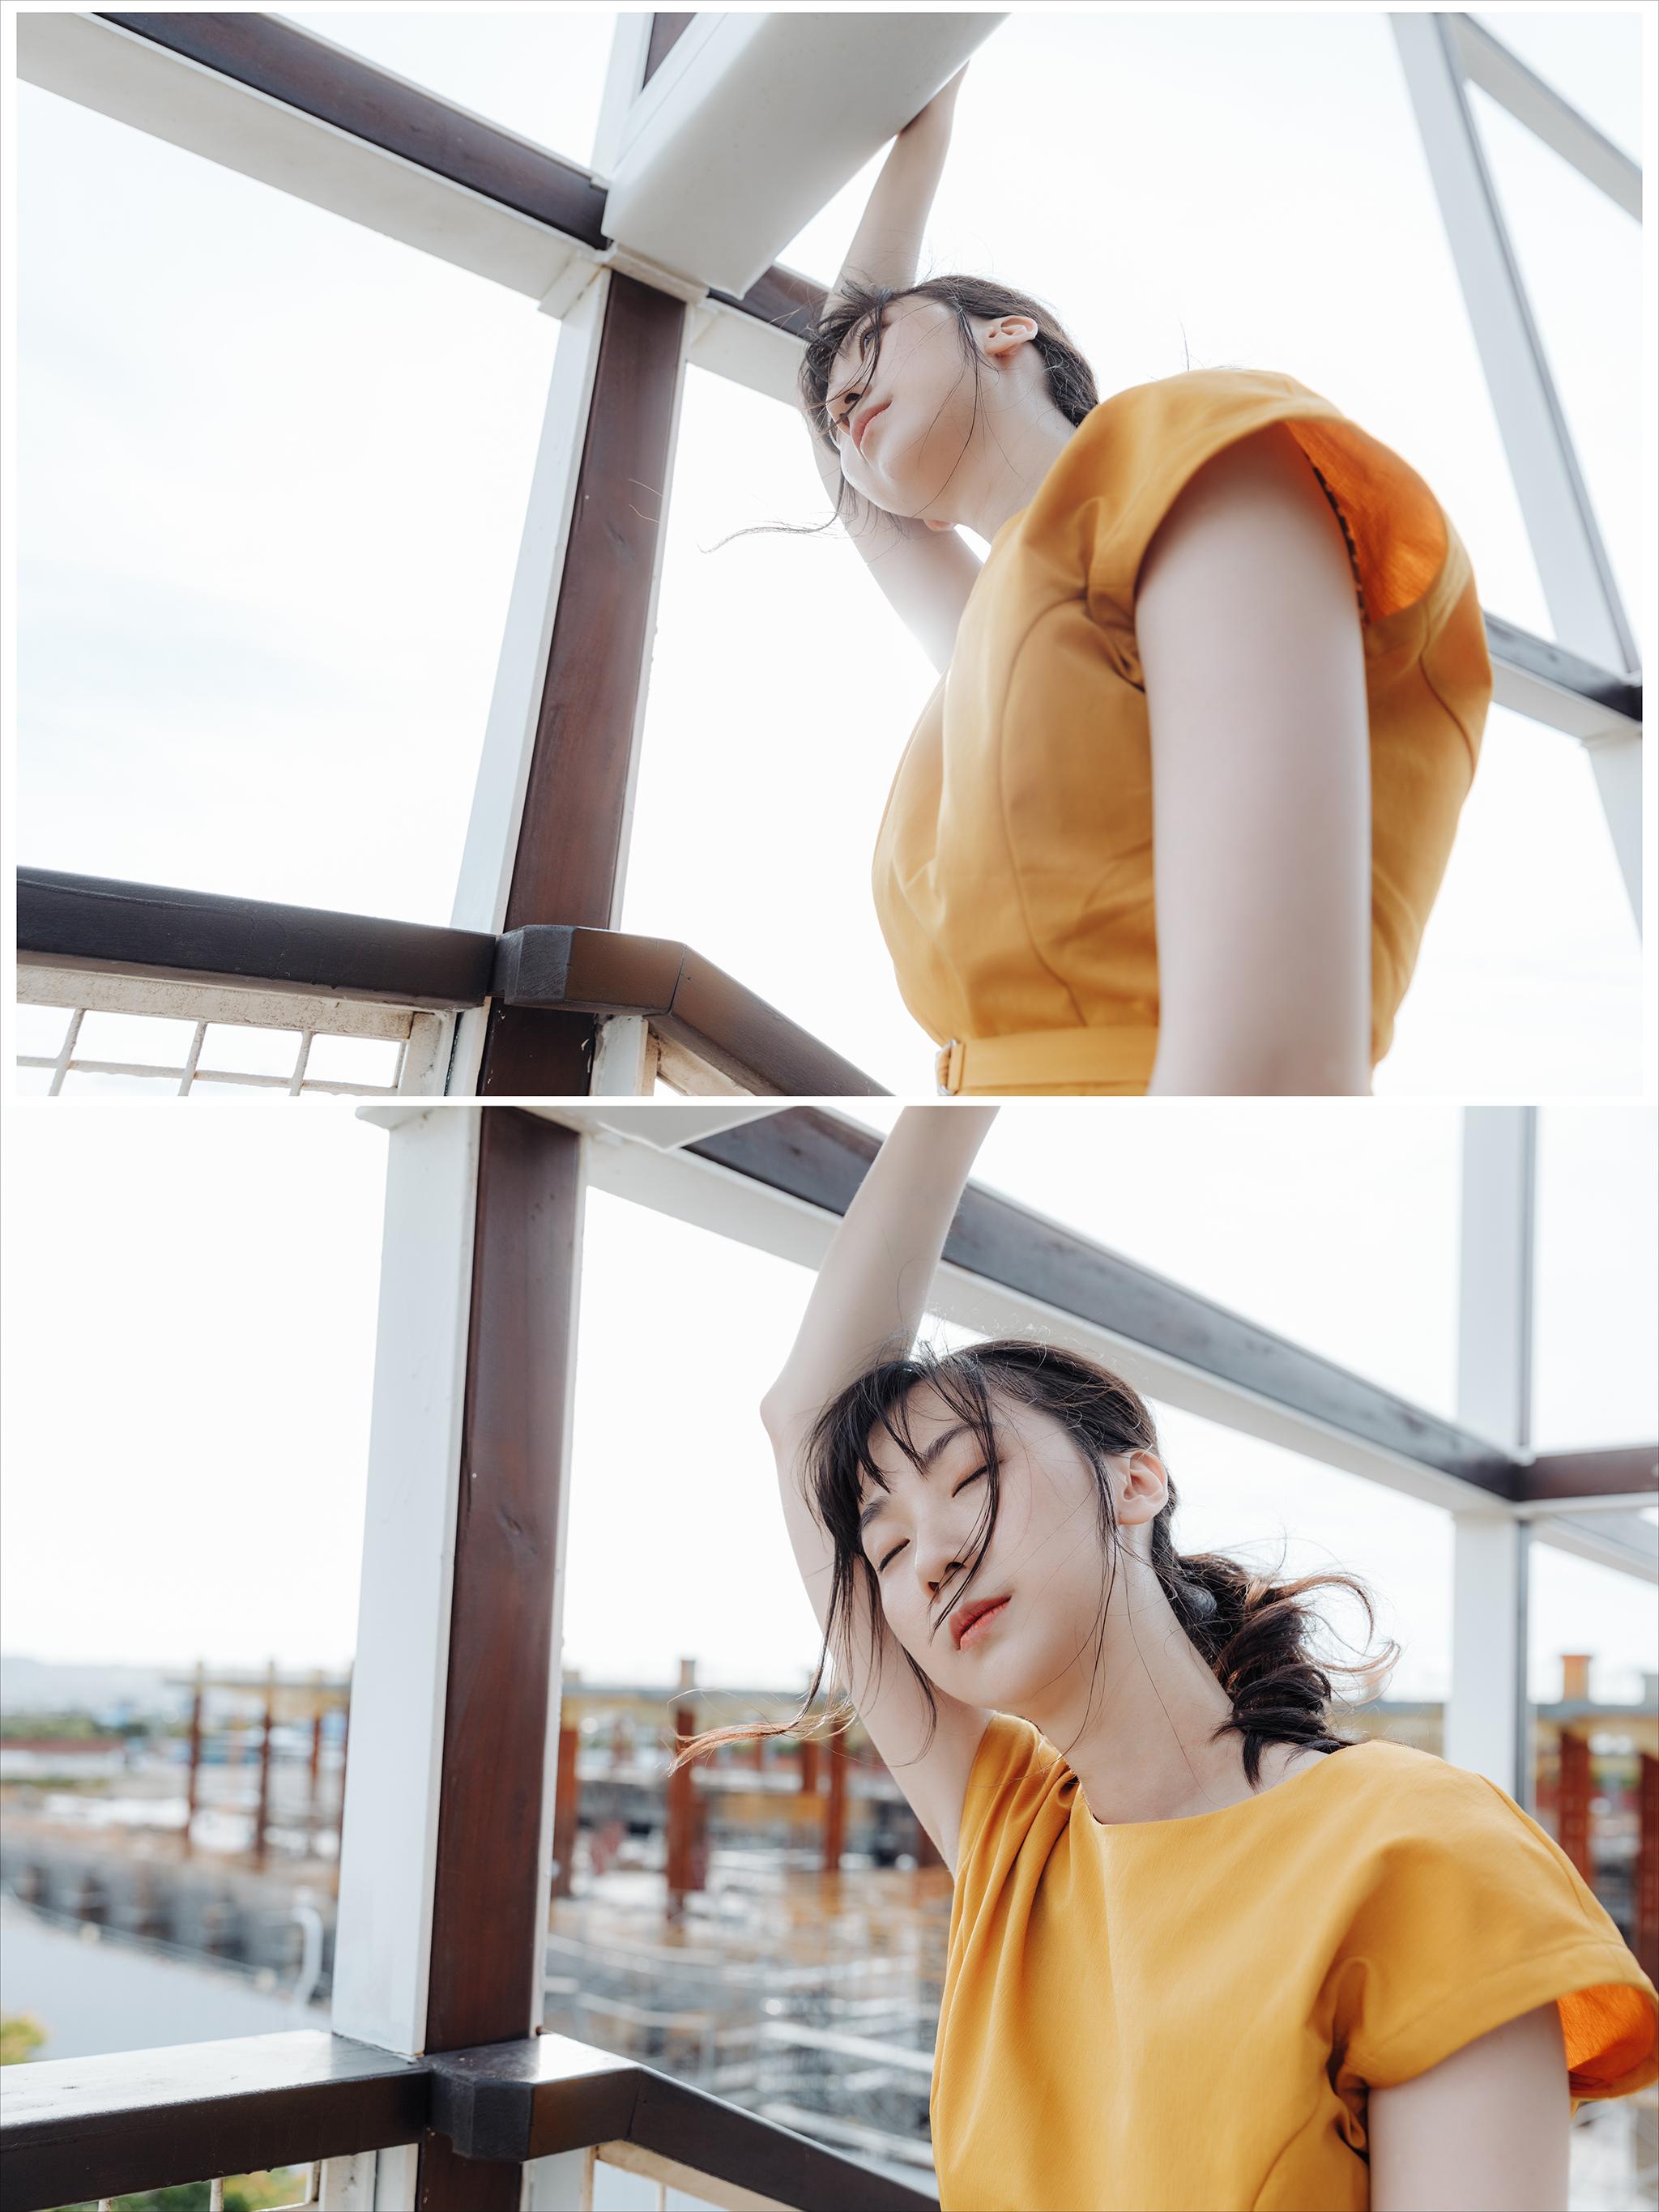 50066935796 89fc62d22a o - 【夏季寫真】+Melody+